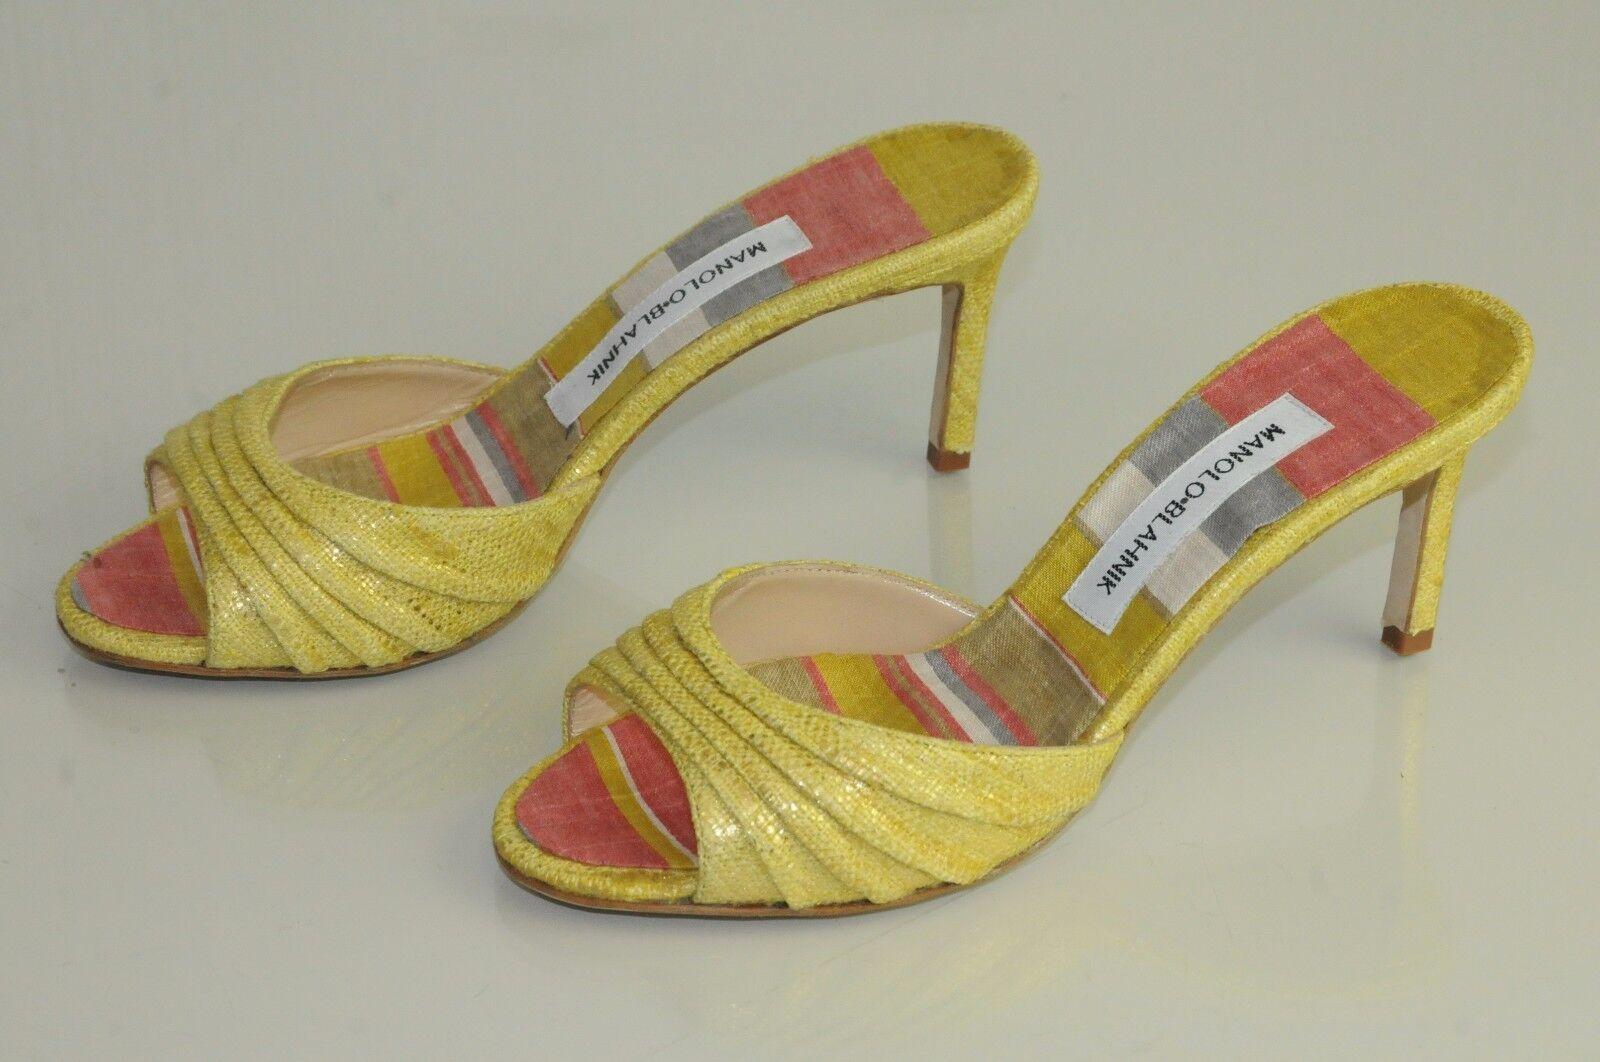 725 NEW MANOLO BLAHNIK Yellow Linen Mules Slides Sandals SHOES bb heels 37